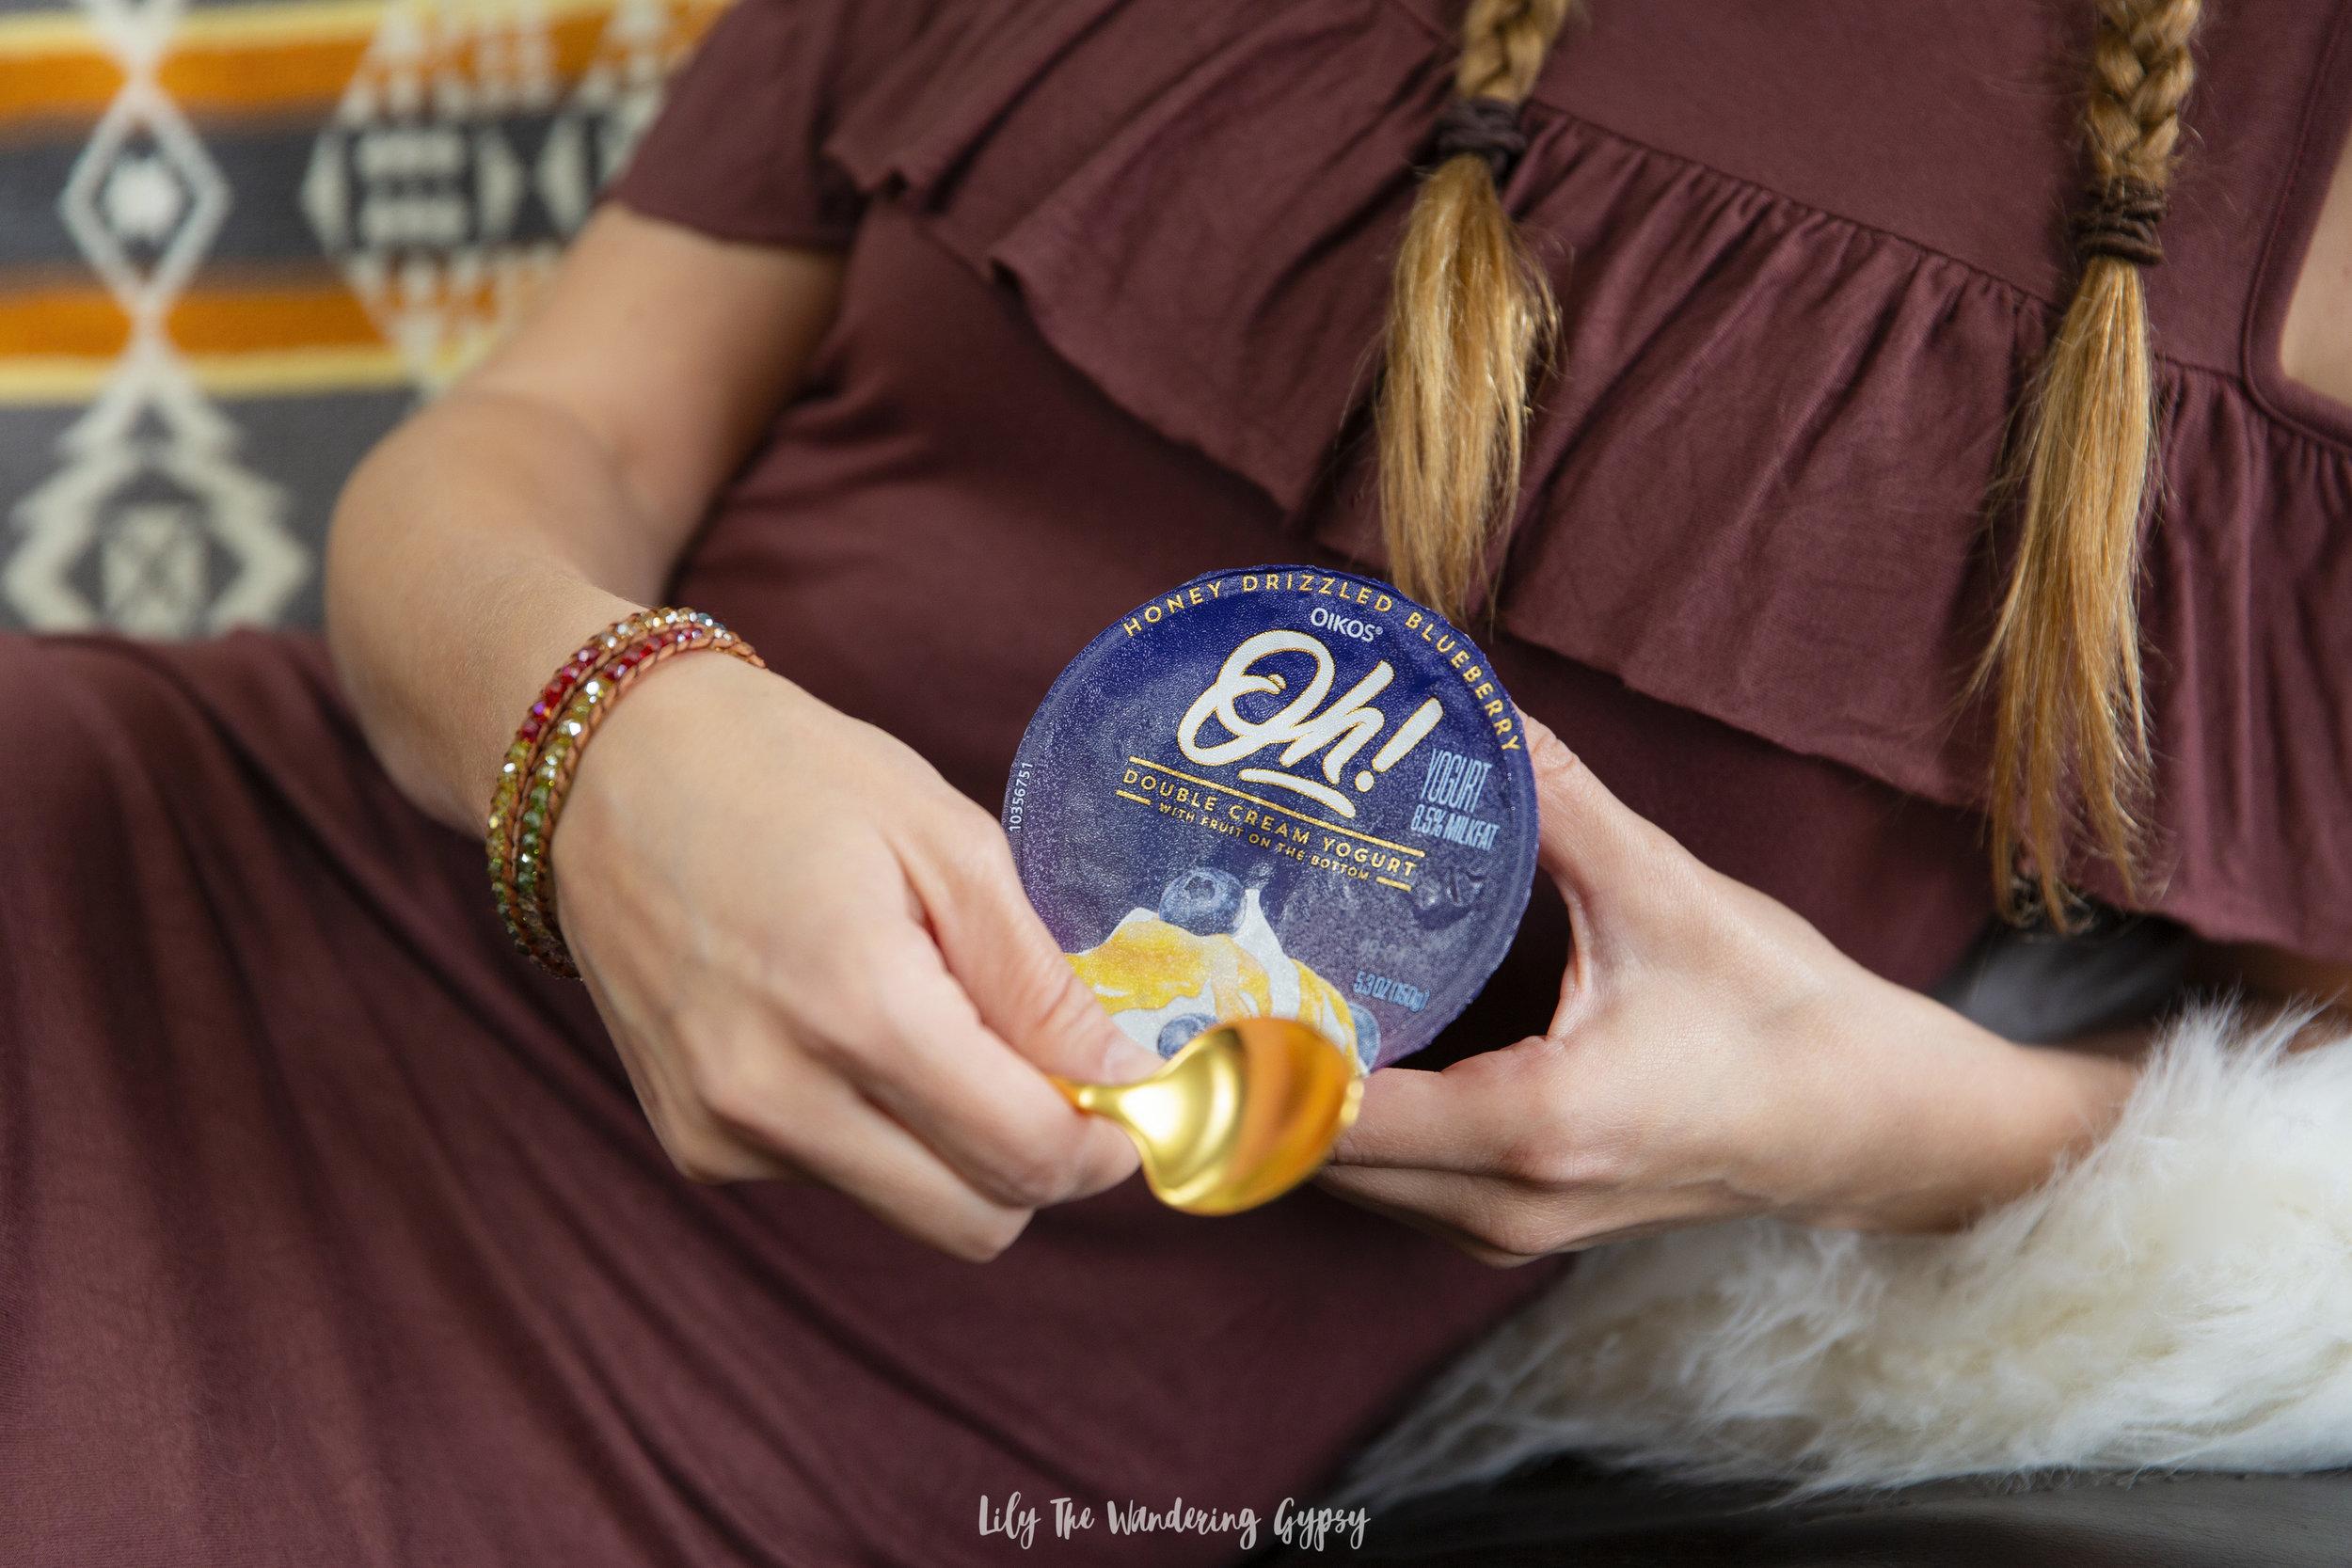 Oikos Oh! Double Cream Yogurt #OhMGMoments